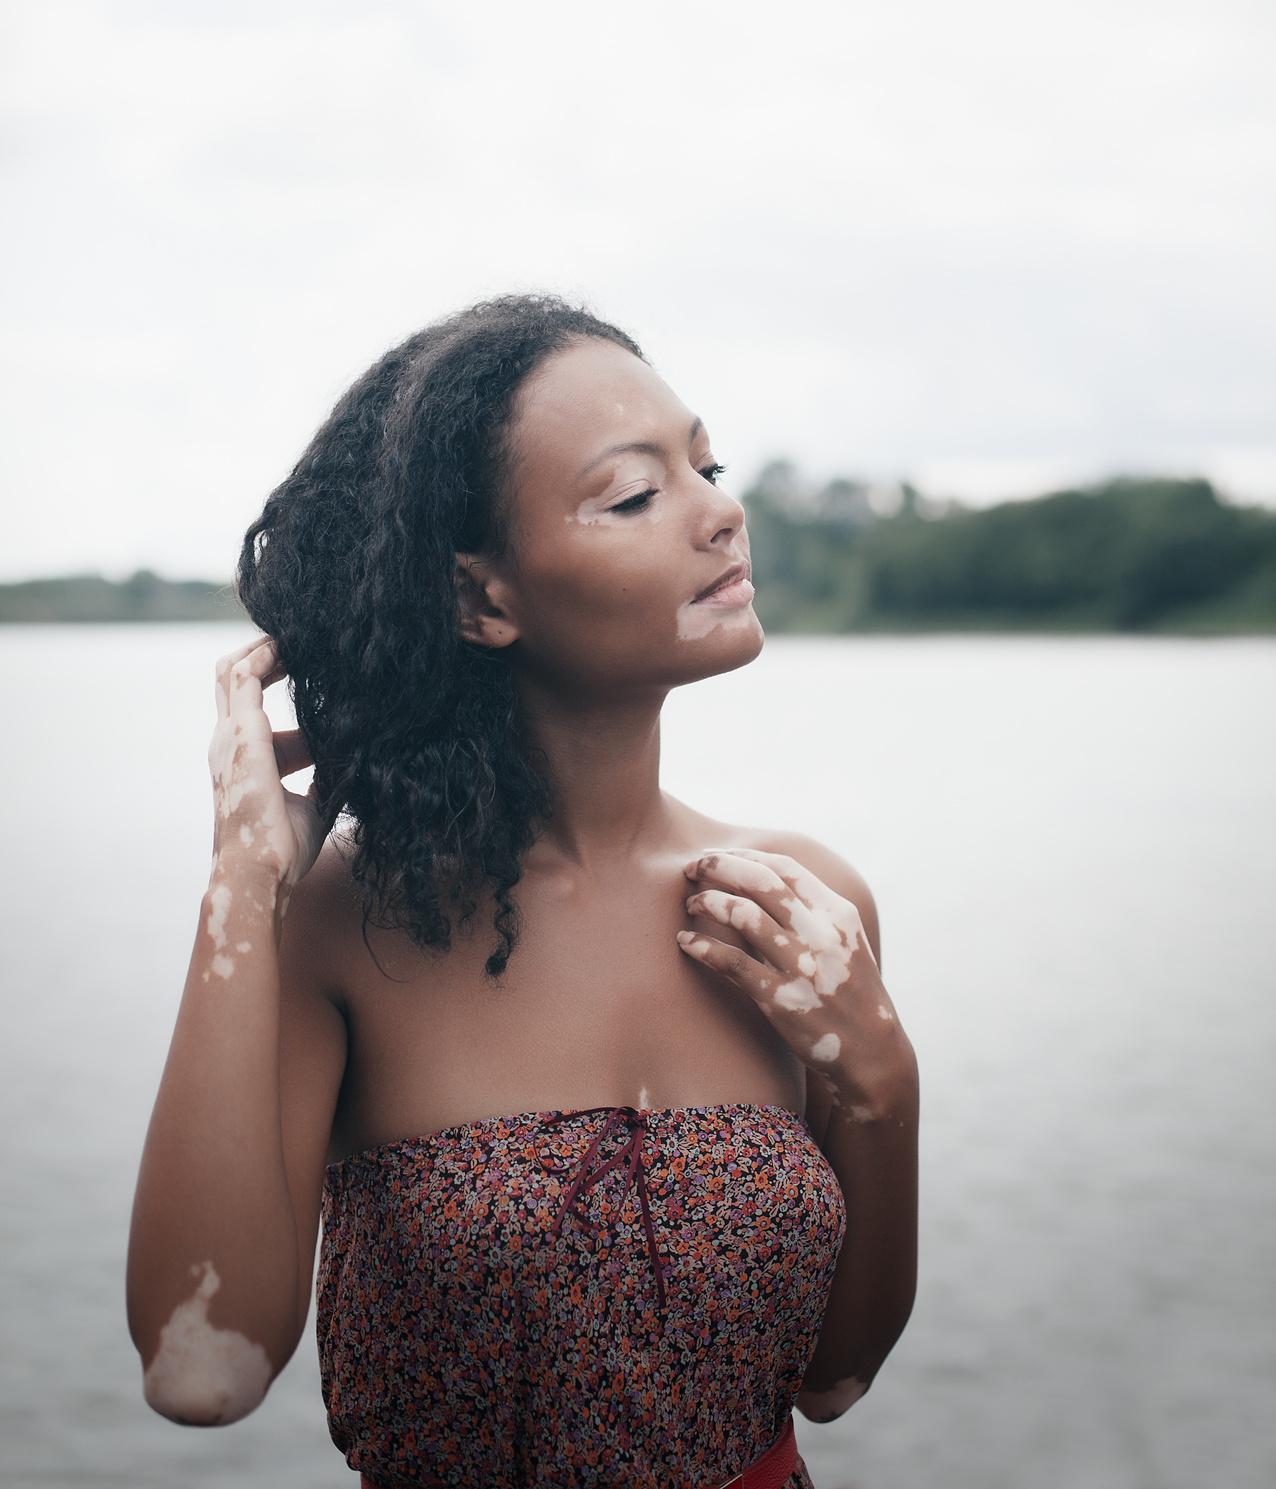 22 Best Natural Home Remedies for Vitiligo treatment